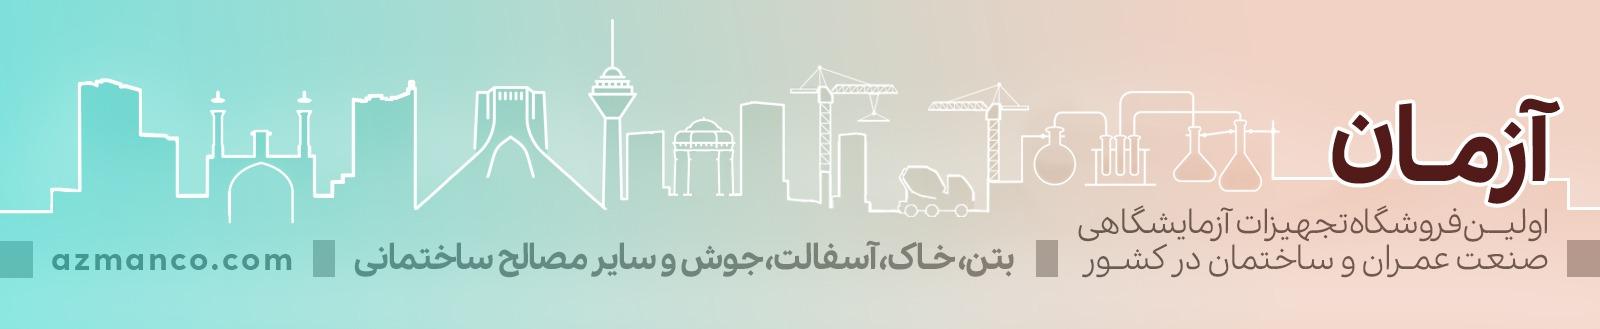 azman banner